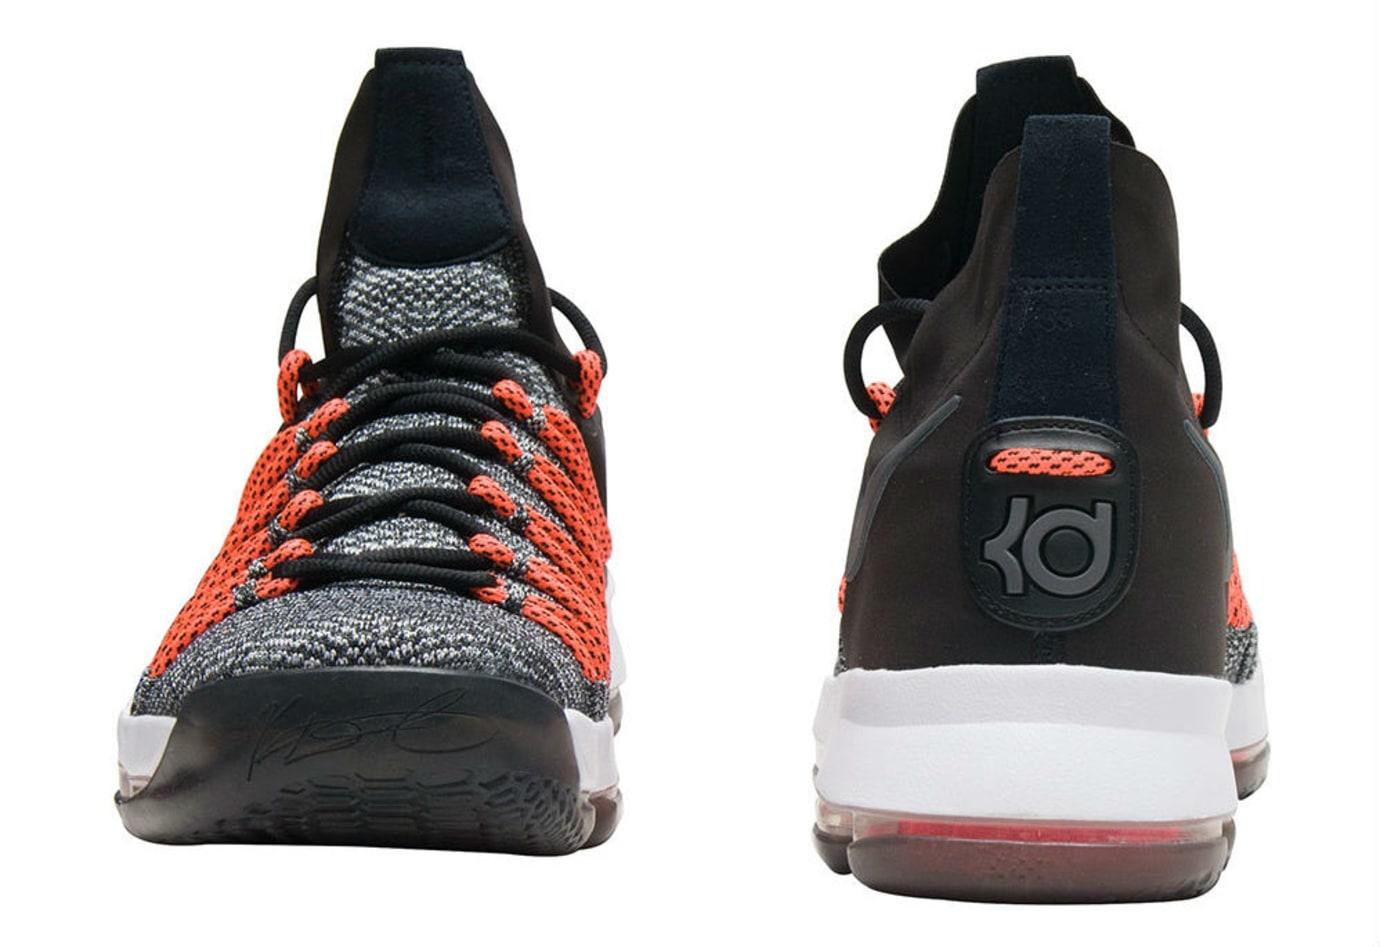 544979229176f Nike KD 9 Elite Black White Dark Grey Hyper Orange Release Date Heel 878637- 010